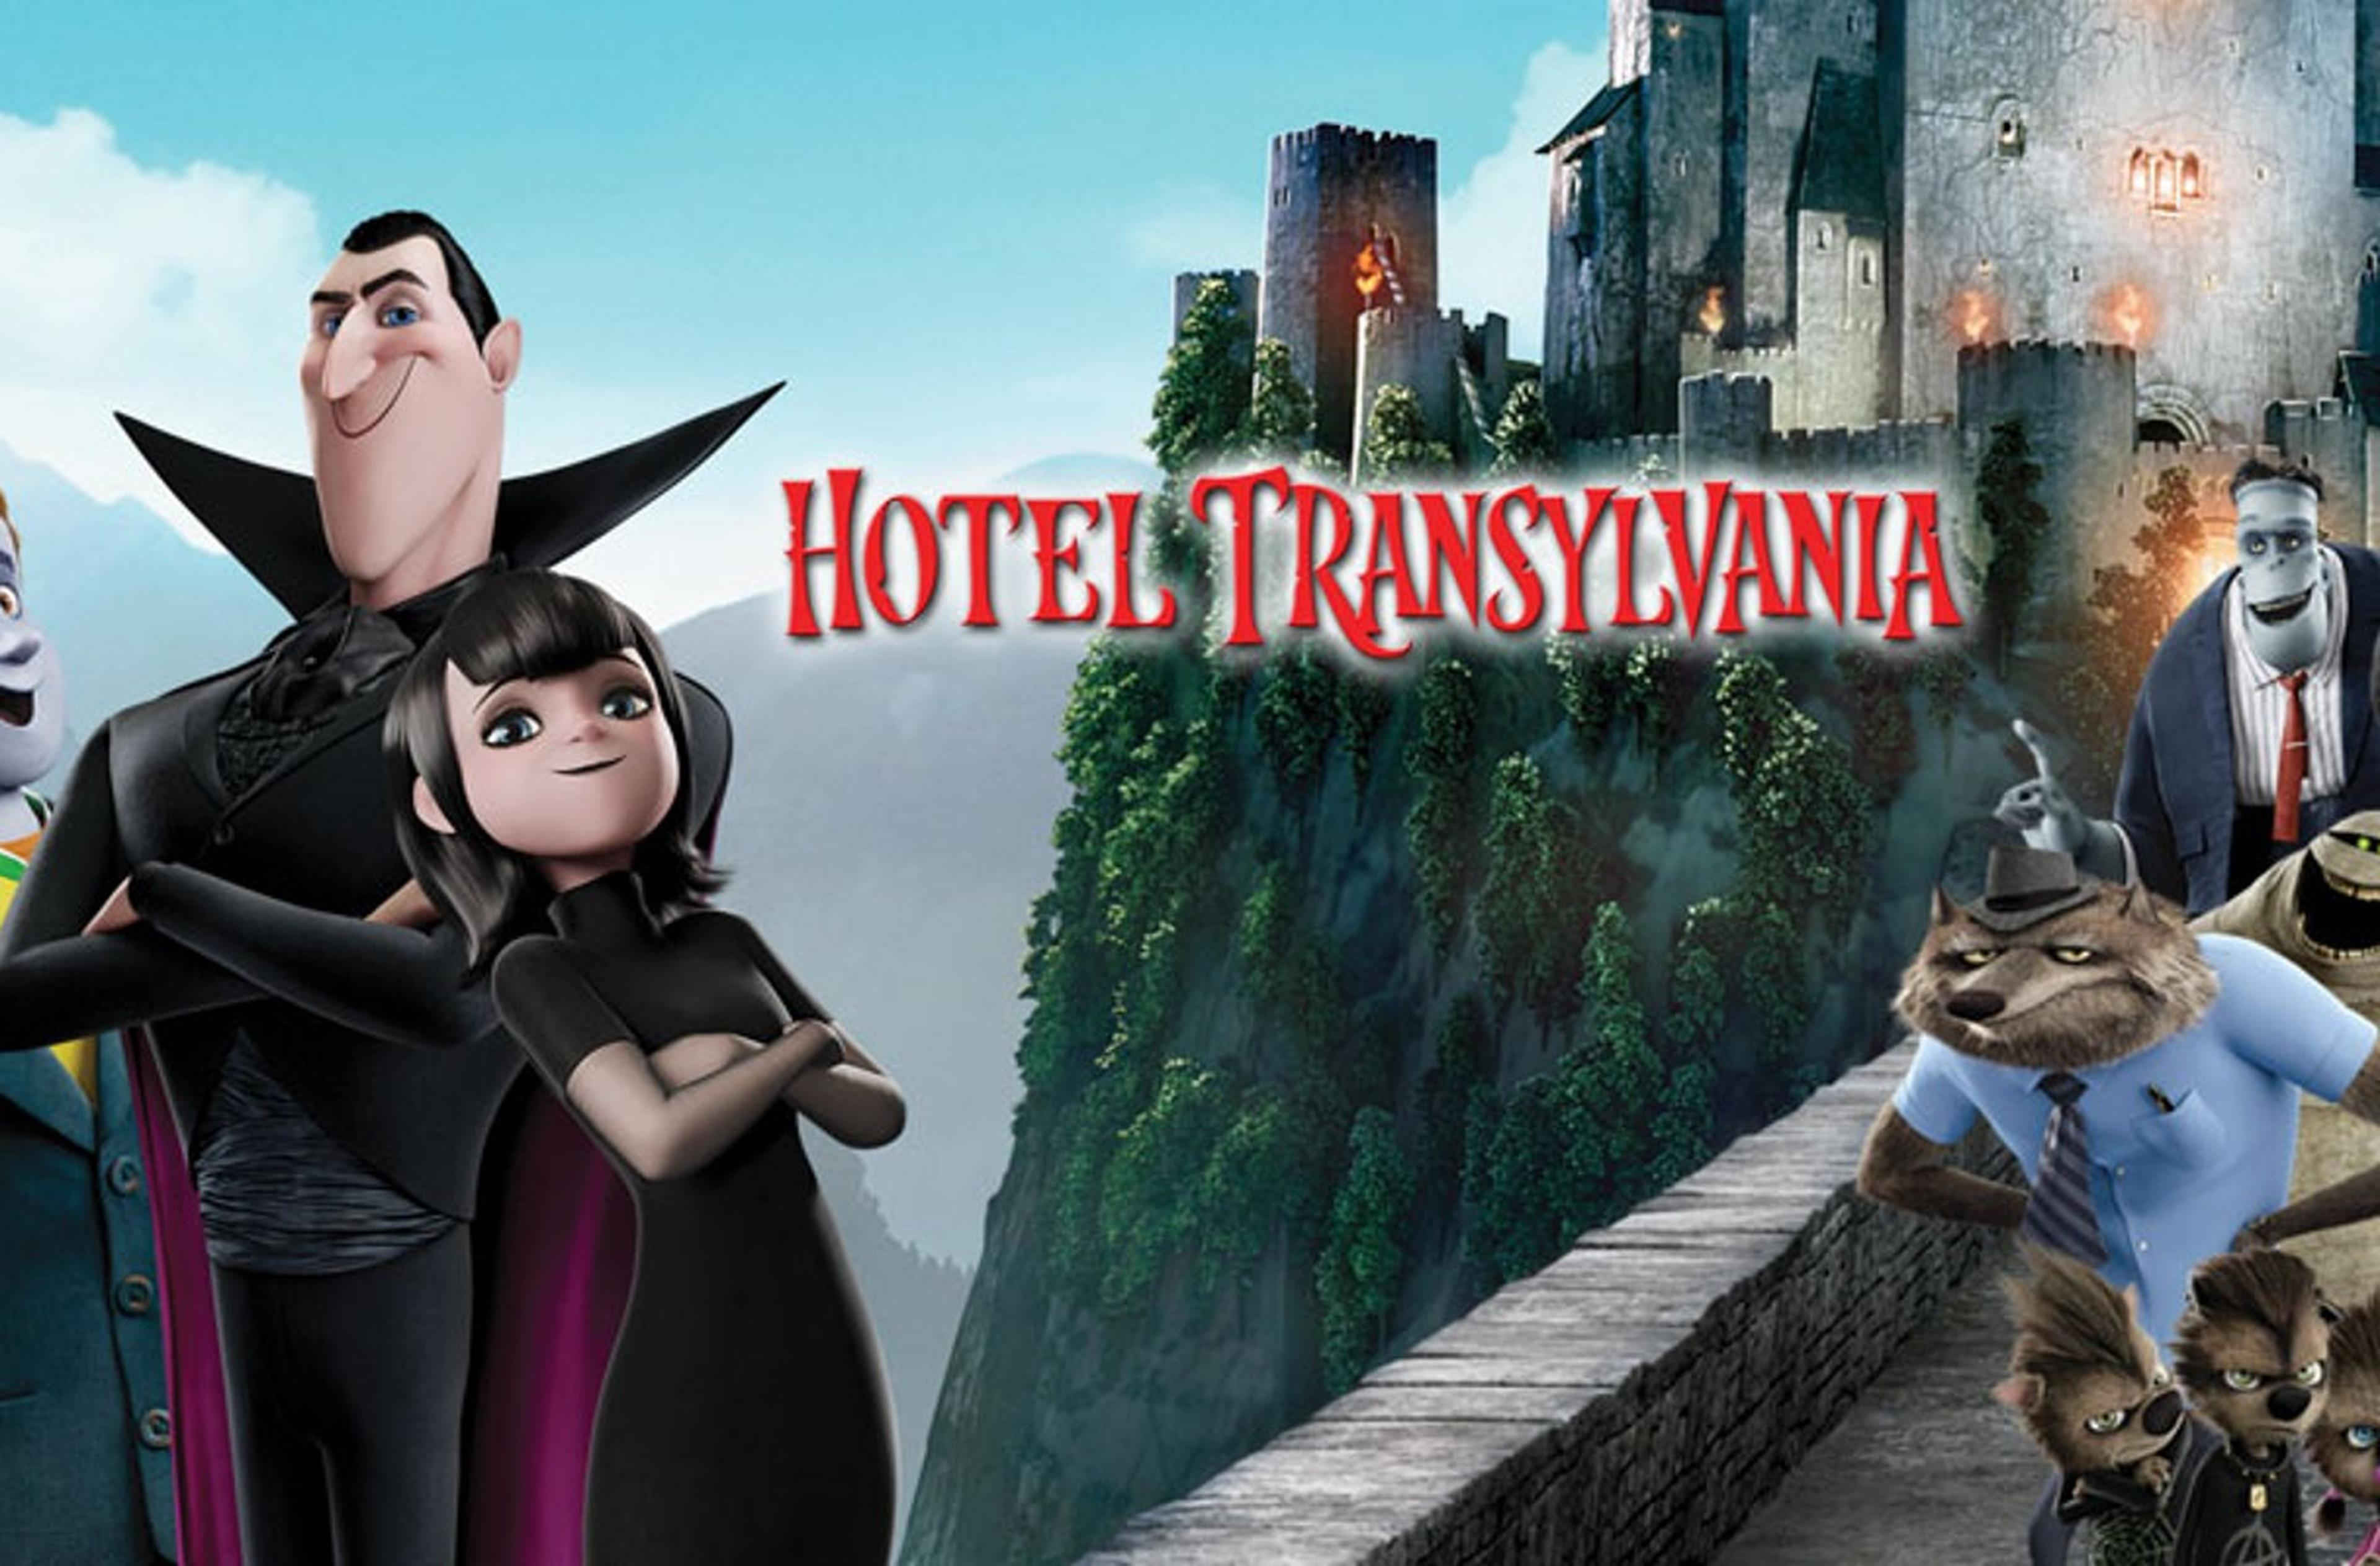 Hotel Transylvania, locandina del film